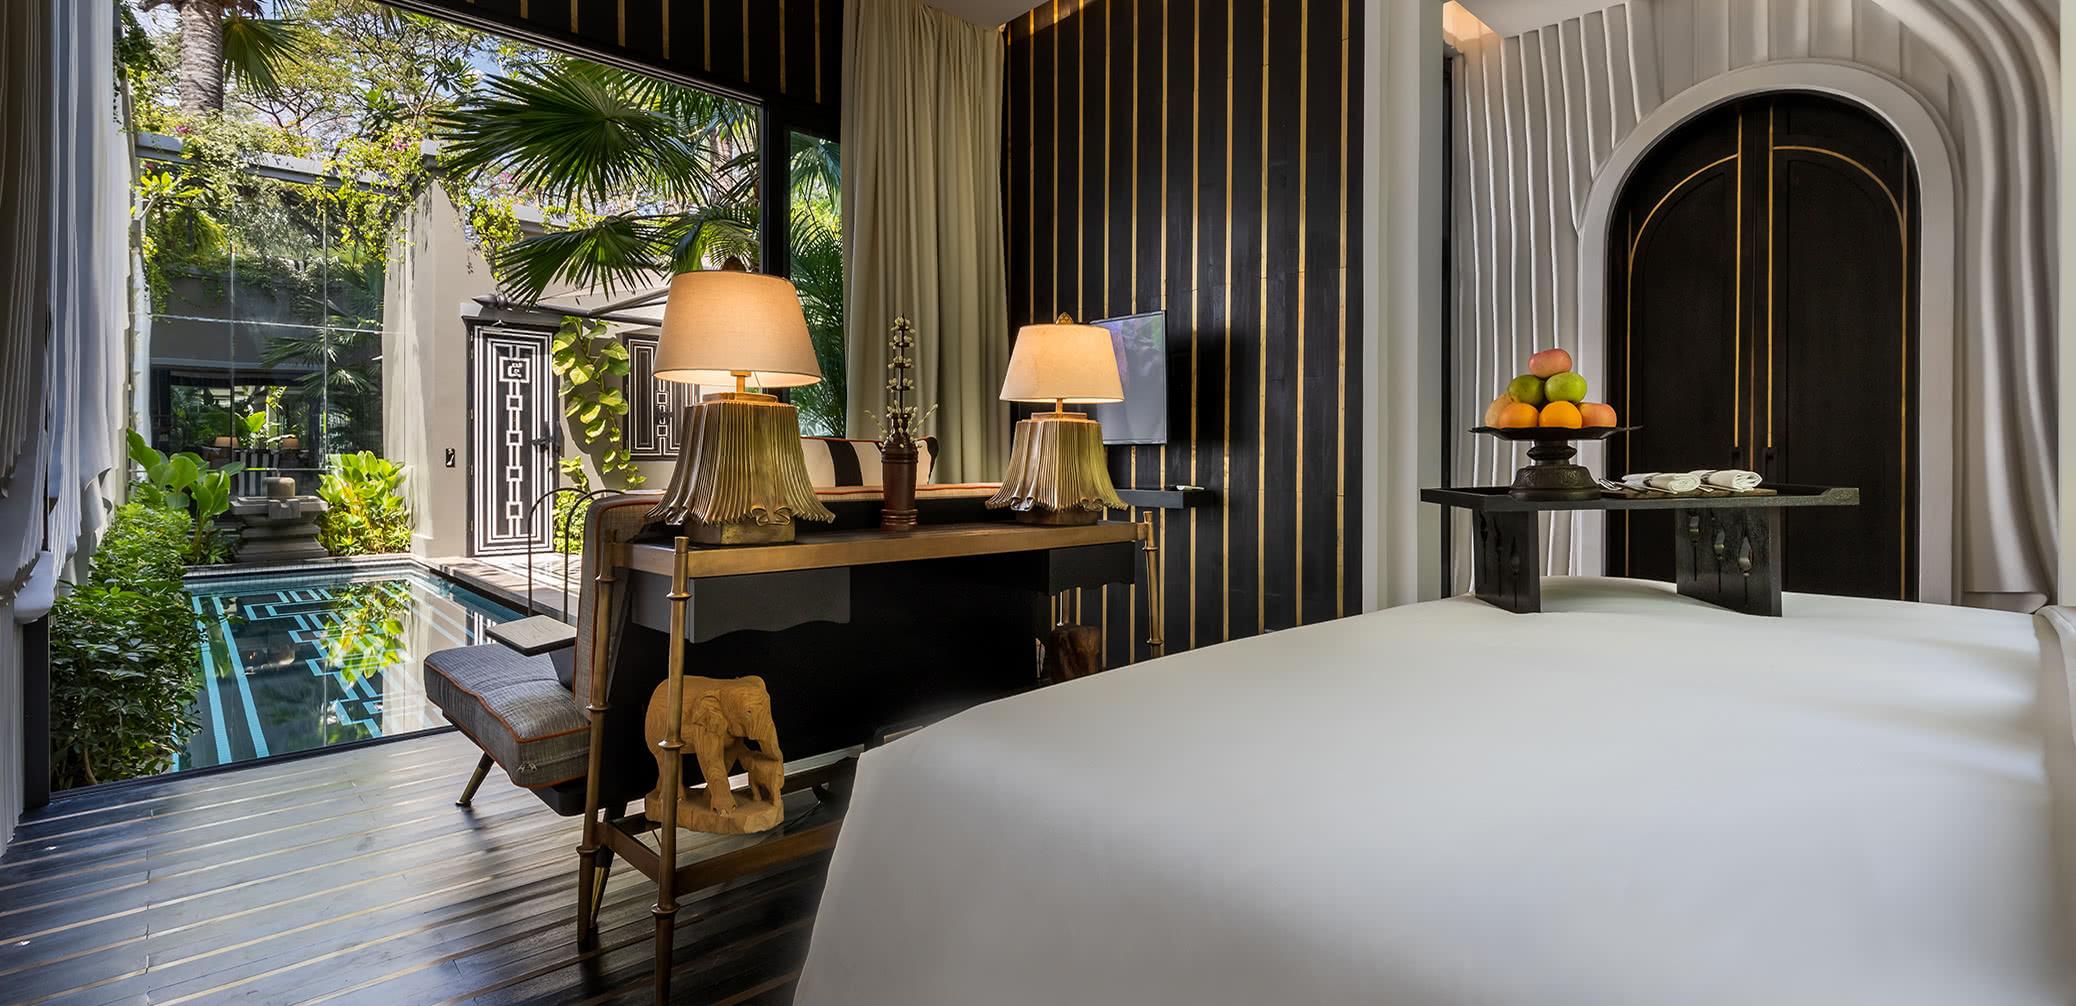 Top 10 Best Luxury Hotels in Cambodia